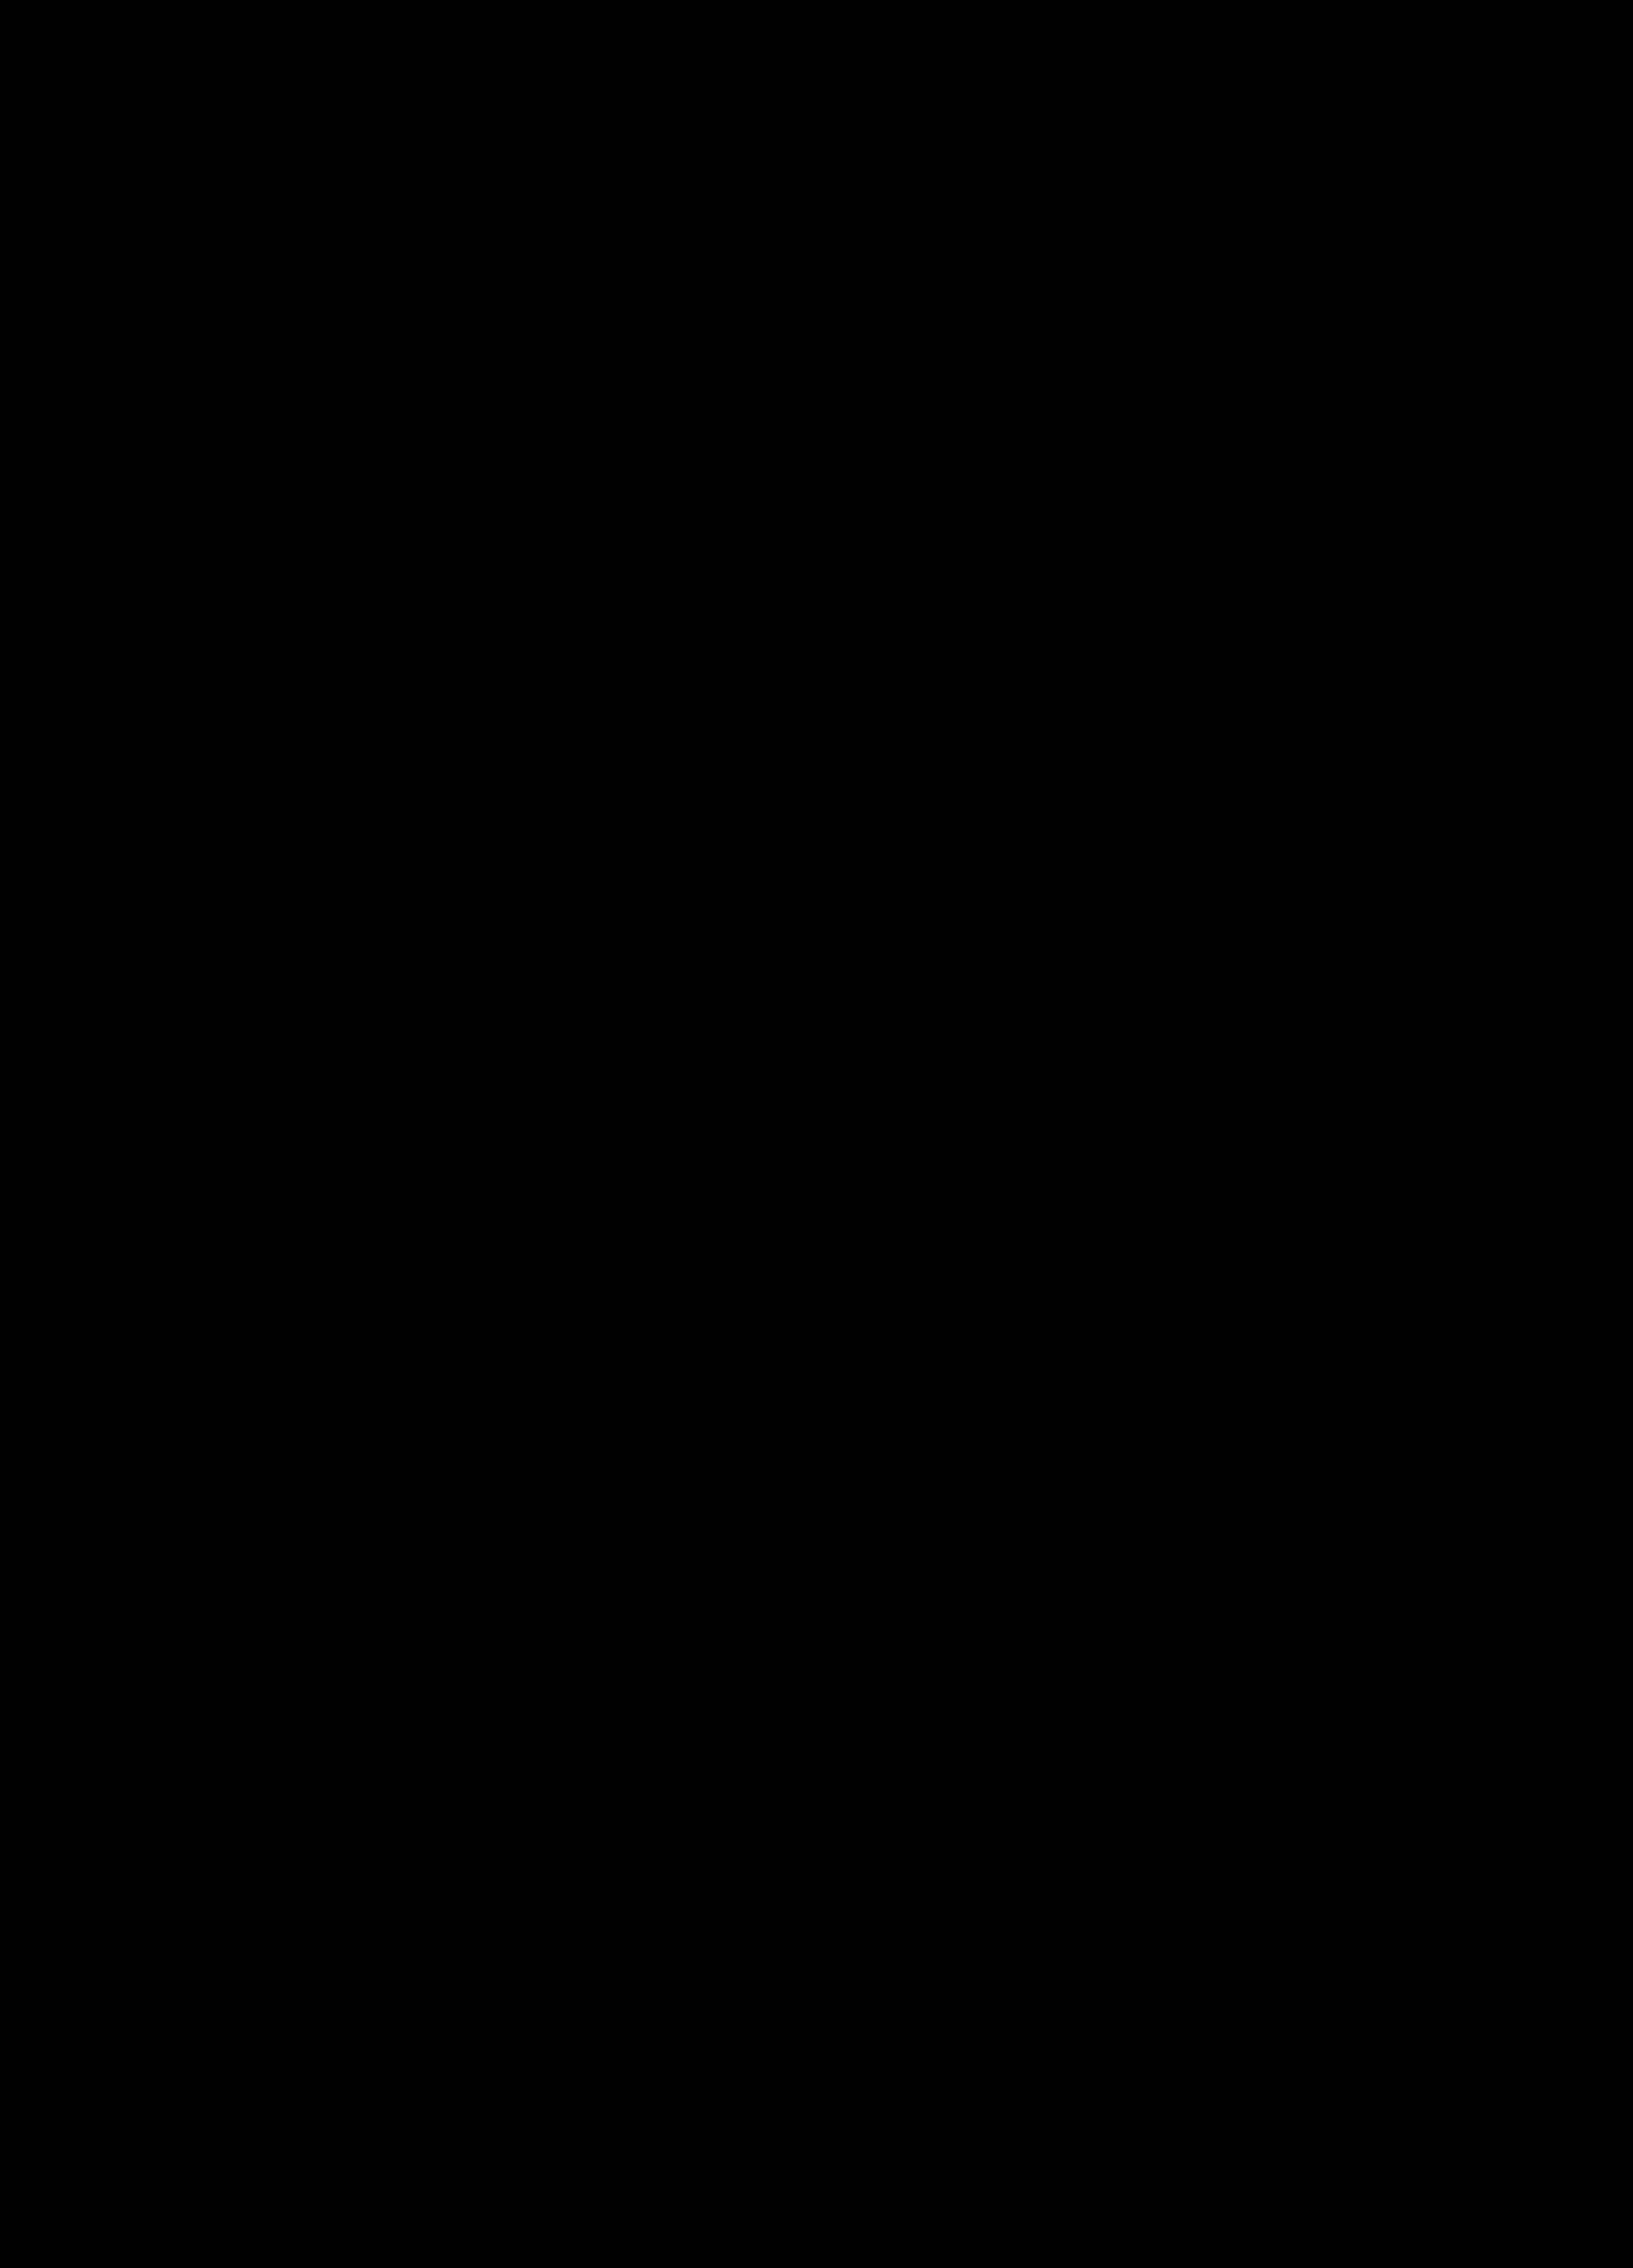 ARBYS Logo PNG Transparent & SVG Vector.